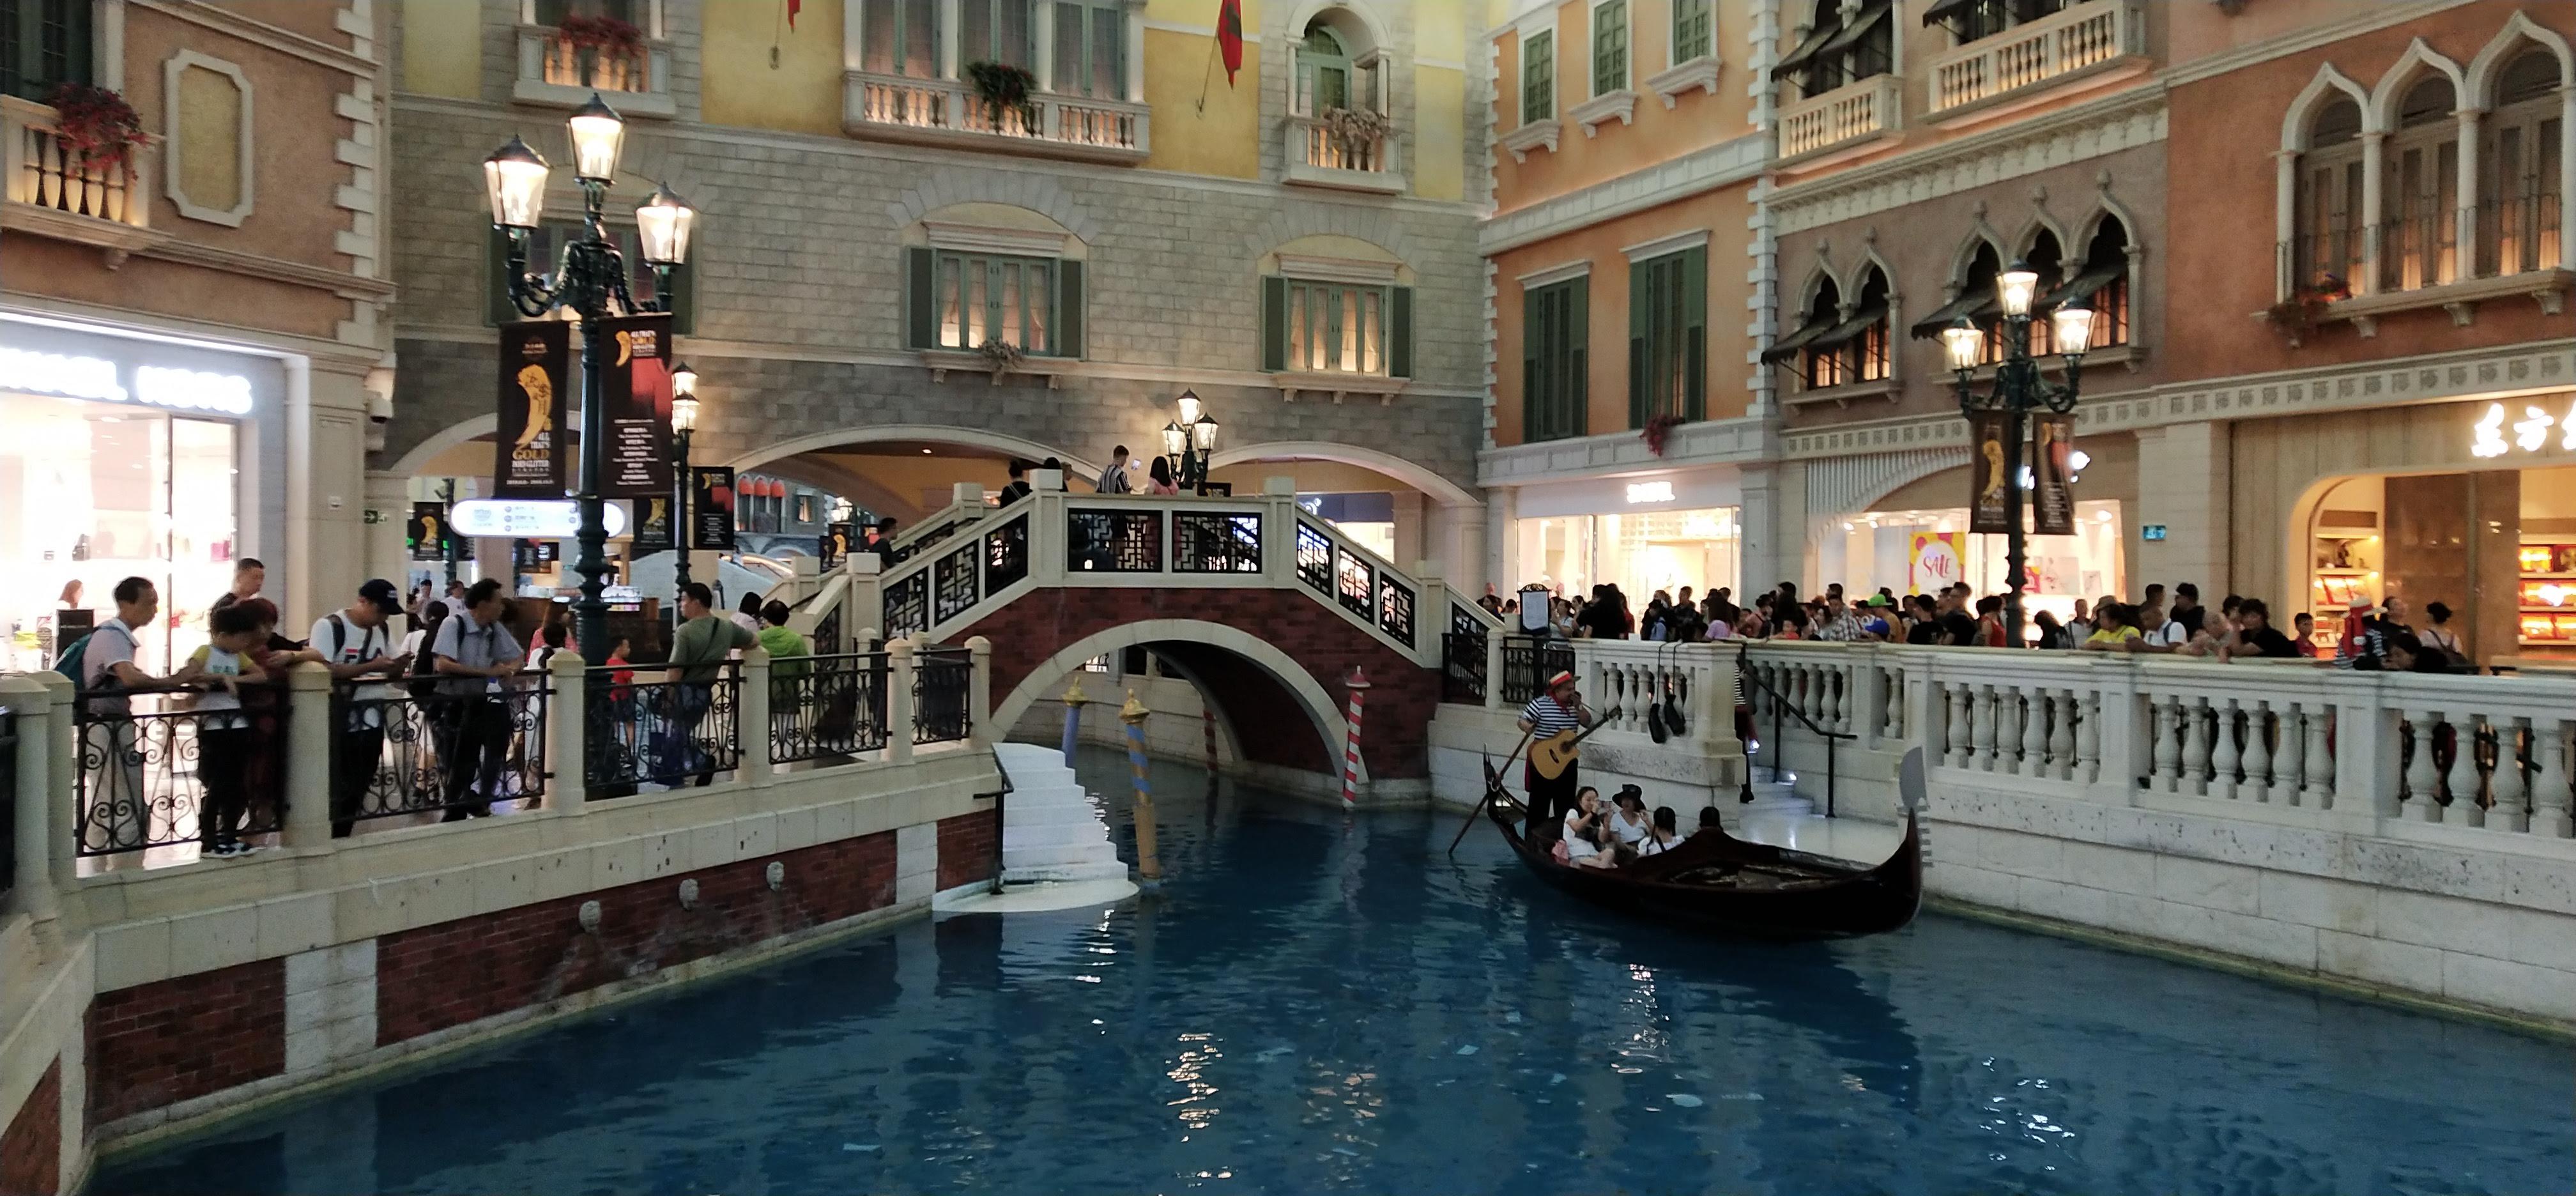 Take Gondola and go shopping at Venetian